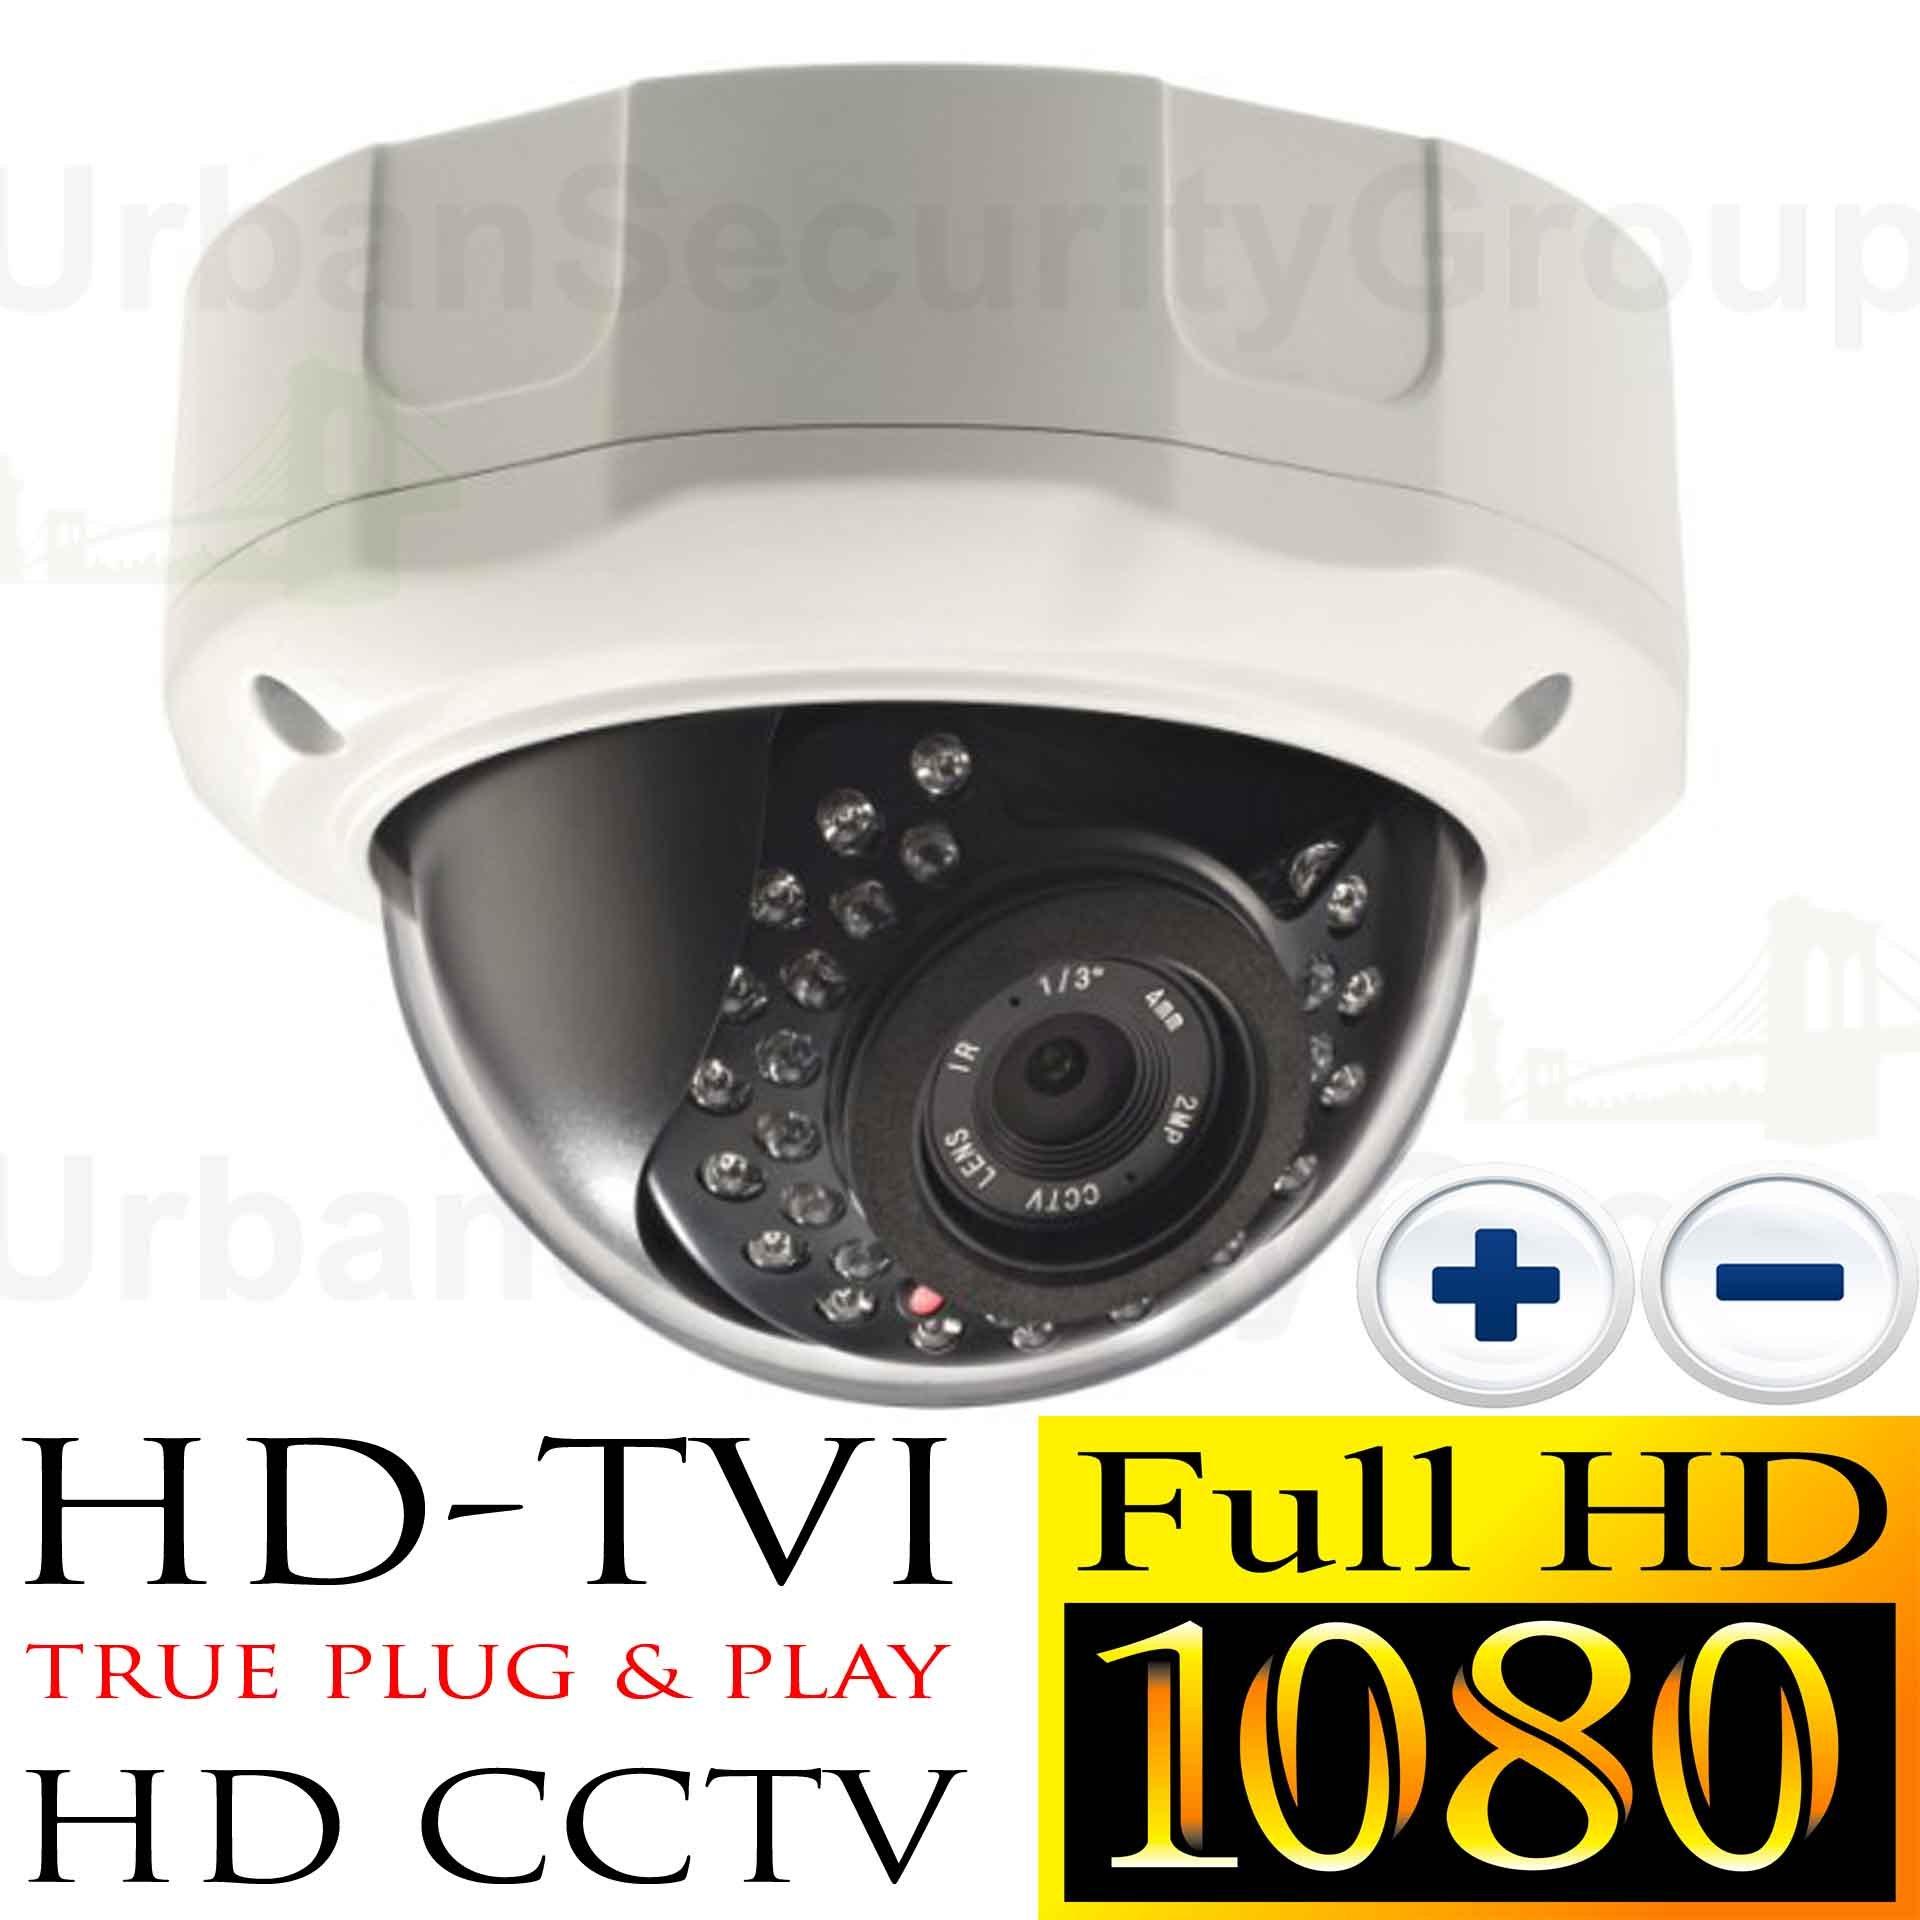 USG Business Grade 1080P 2MP High Definition CCTV Dome Security Camera : MOTORIZED 2.8-12mm Vari-focal Lens : Auto-Focus, 1920x1080 HD Resolution, 30x IR LEDs, IR-Cut, WDR, Motion Detection, SONY Chip